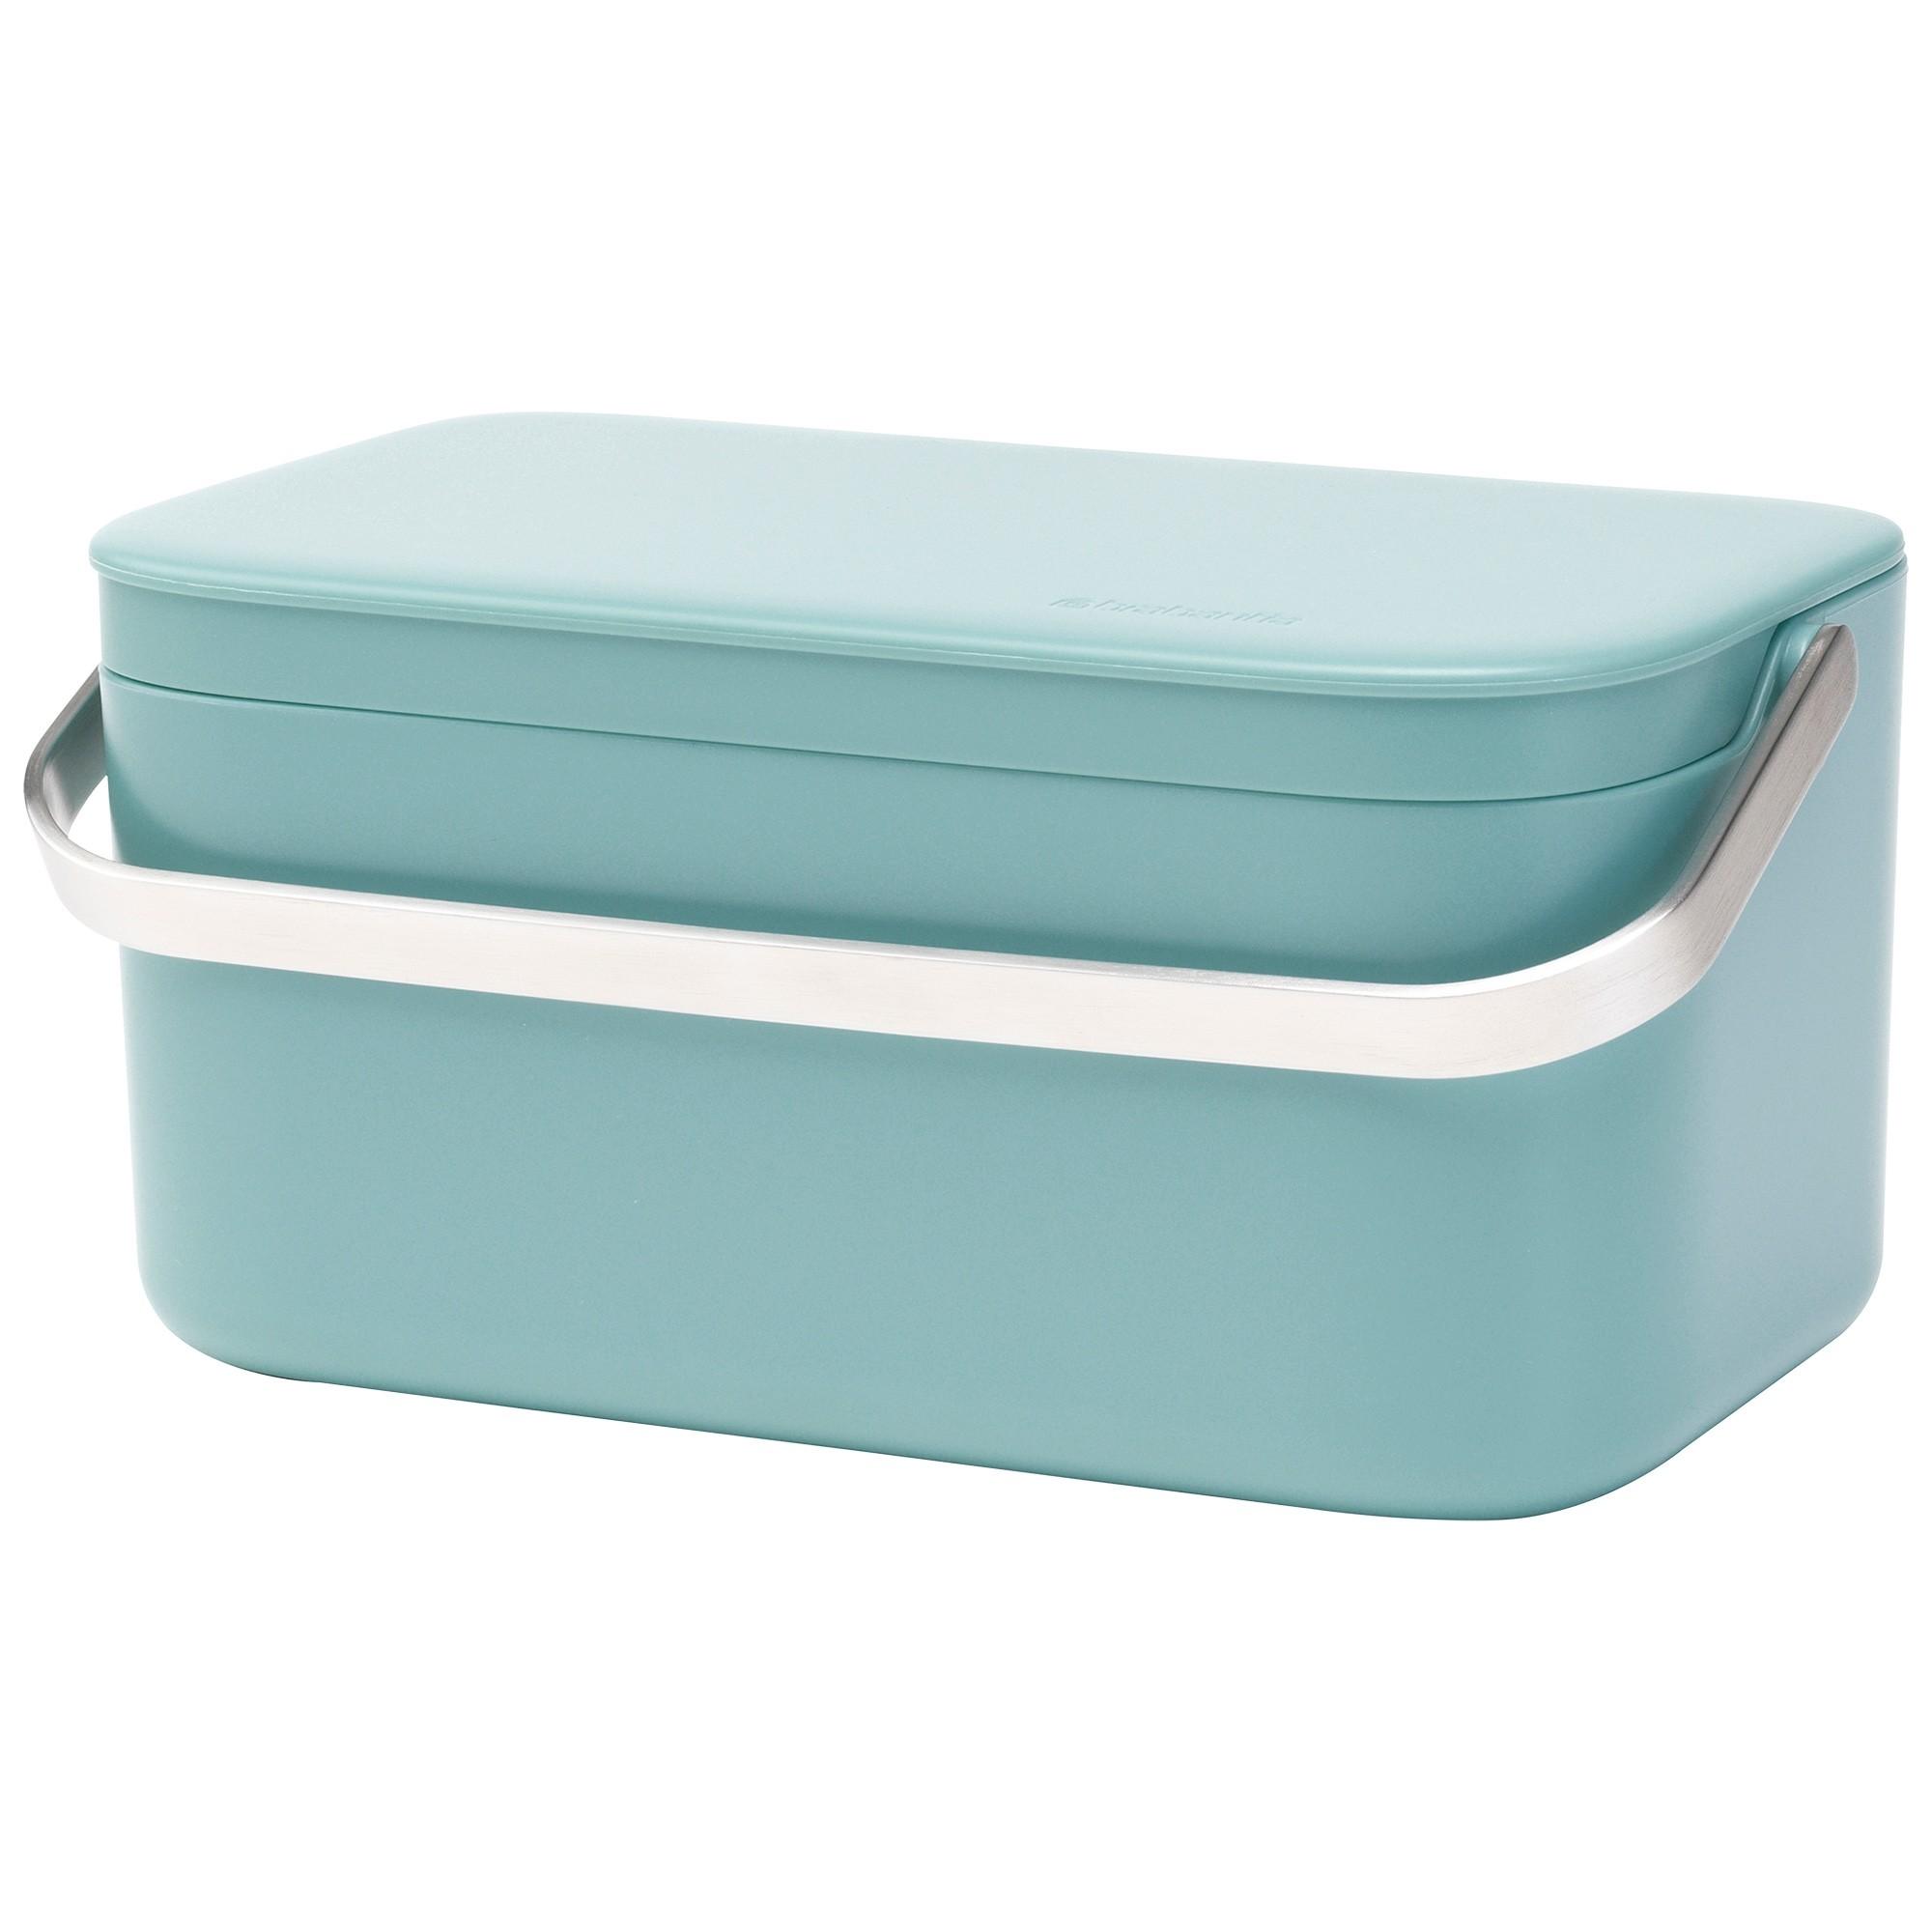 Brabantia Food Waste Caddy, Mint